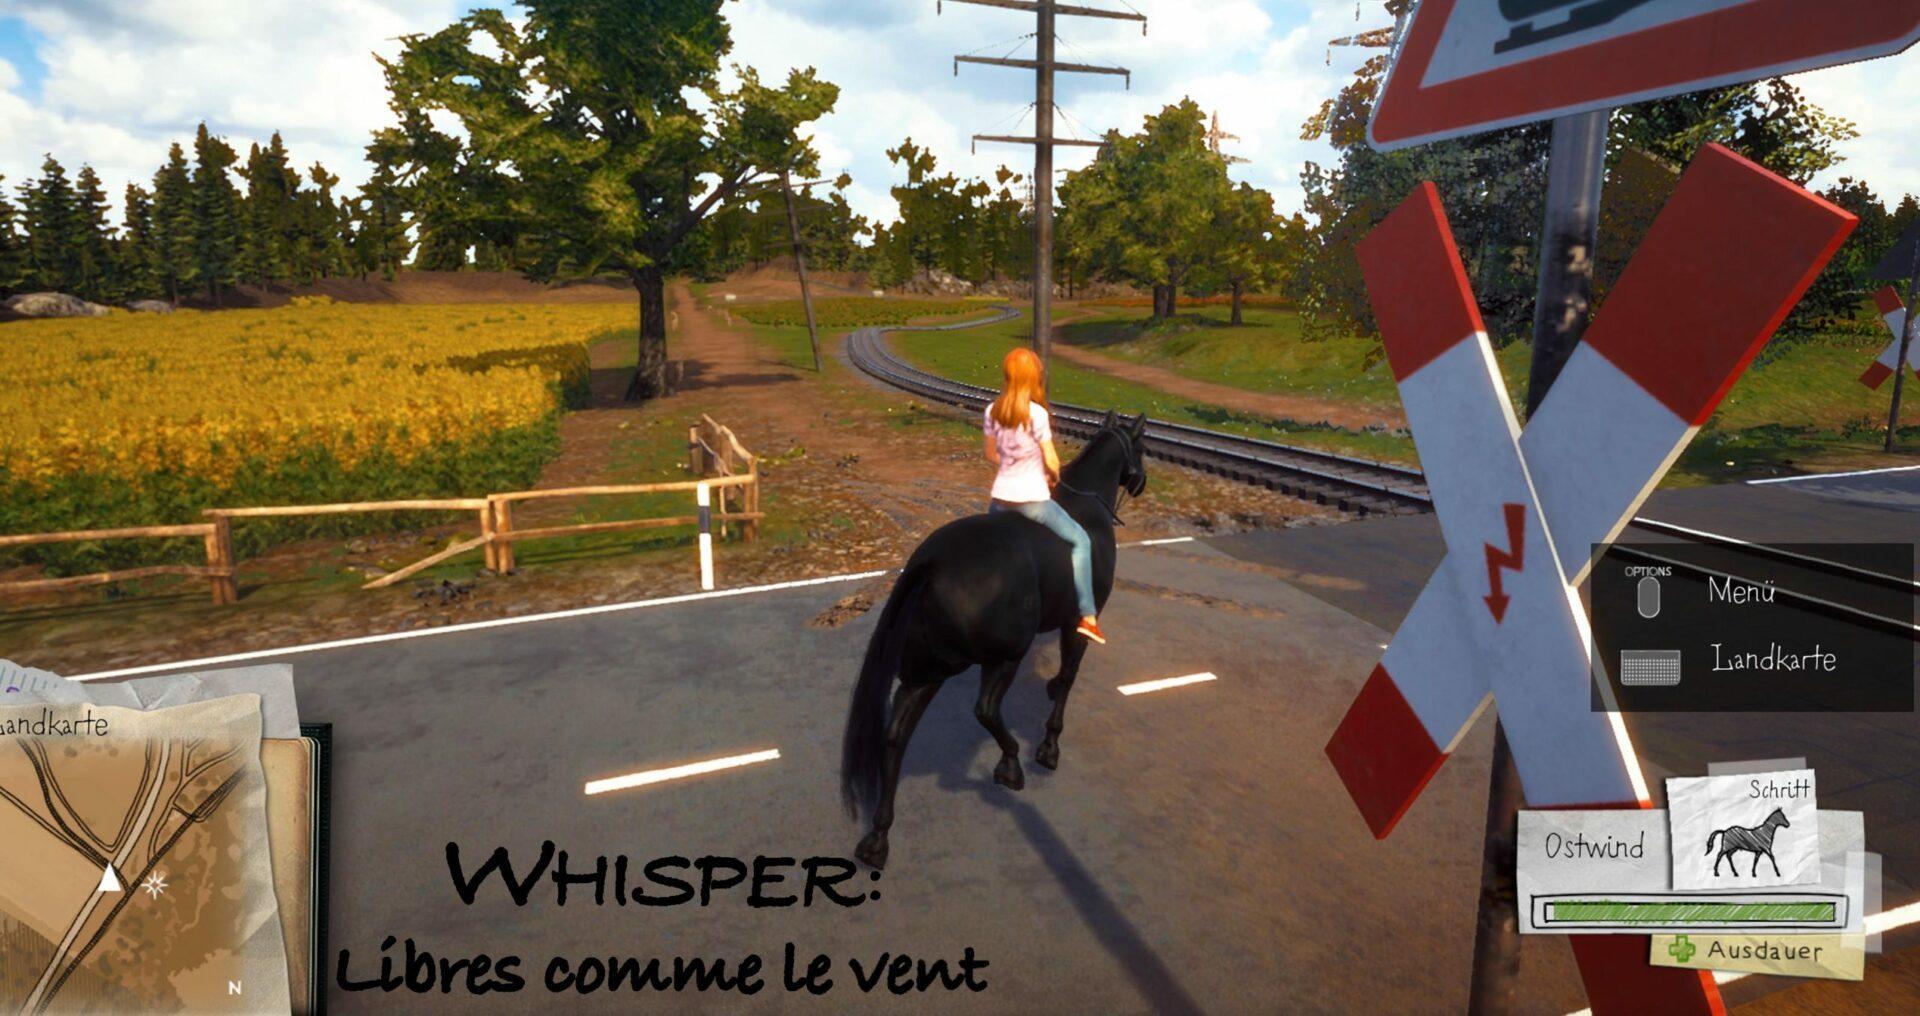 ScreenShot1 Whisper